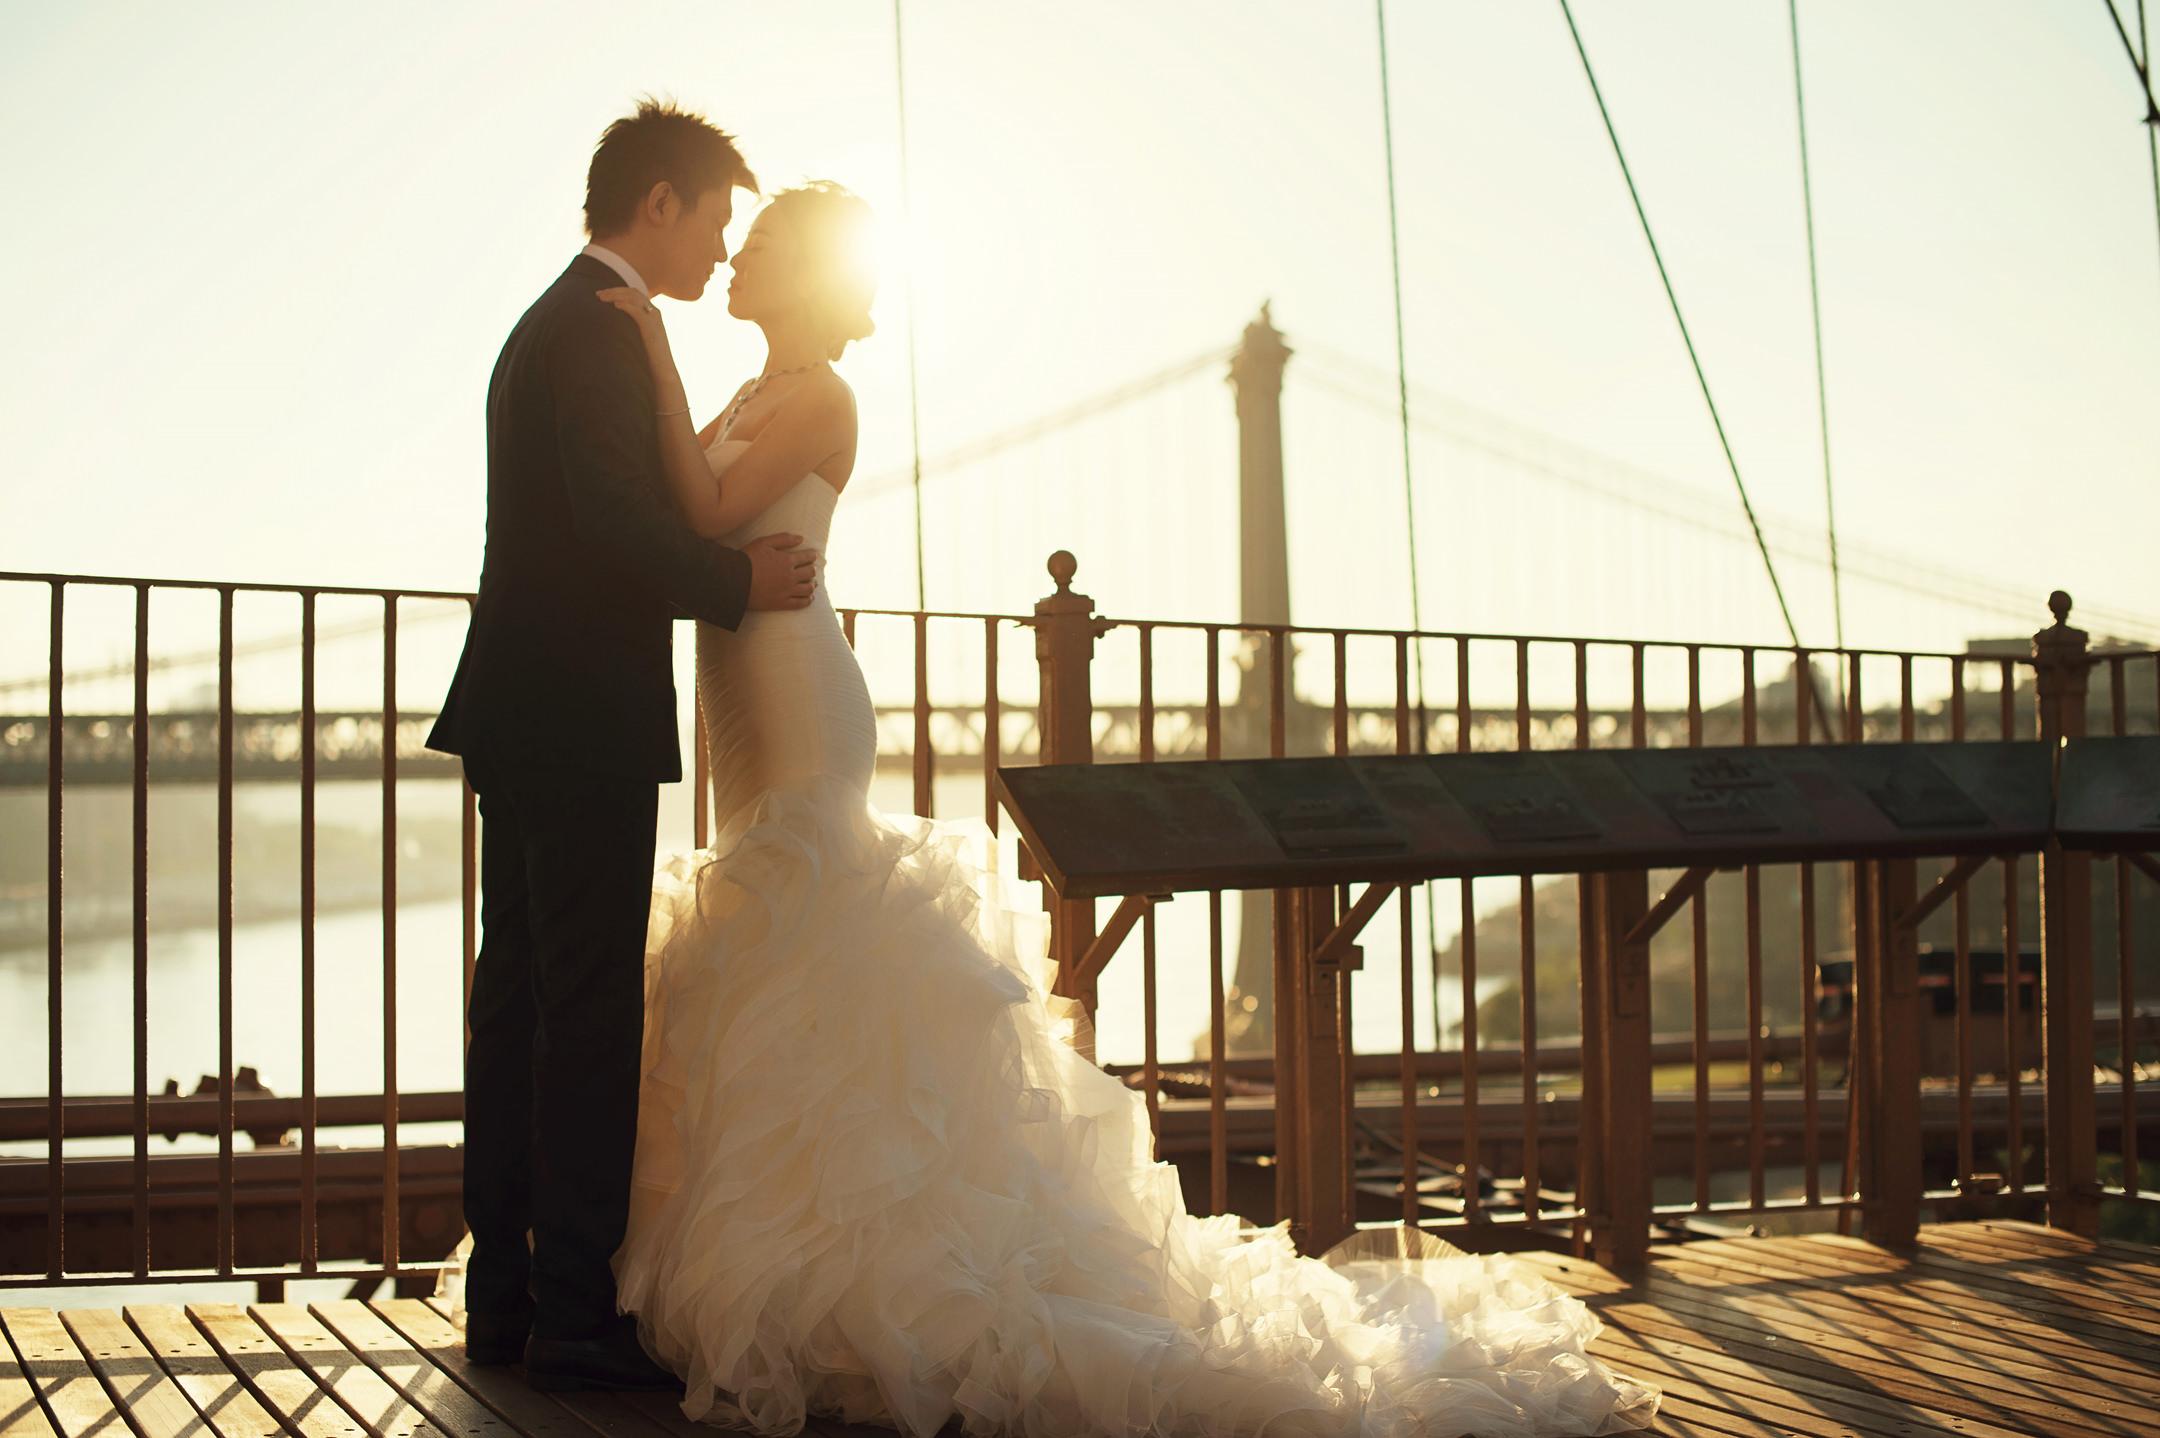 Brooklyn_Bridge_Pre-Wedding_婚紗照_Chris_Hui_Photography_紐約_NYC021.JPG